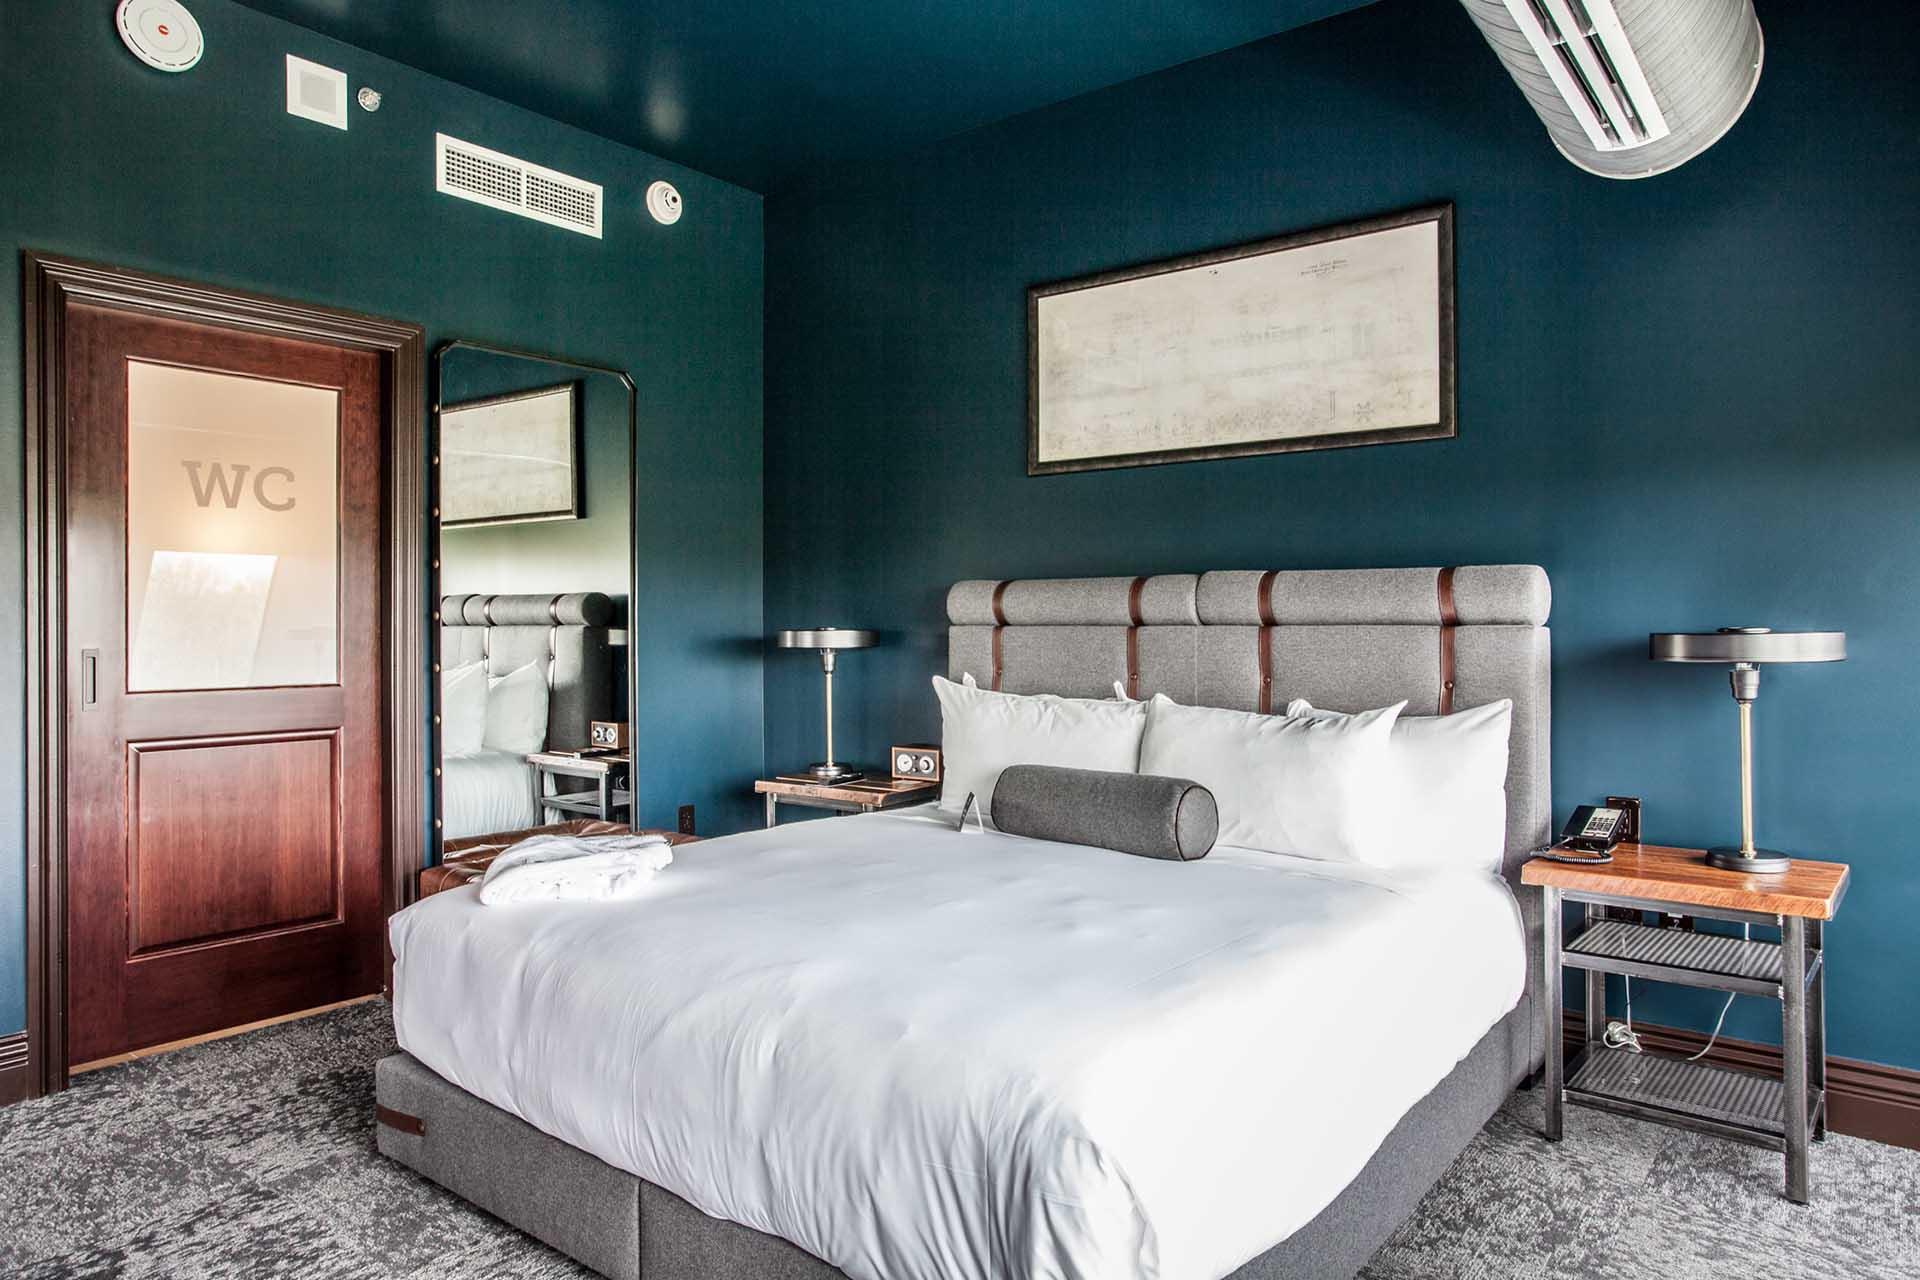 2{Legacy Suite Terrace - Hotel Tonight}